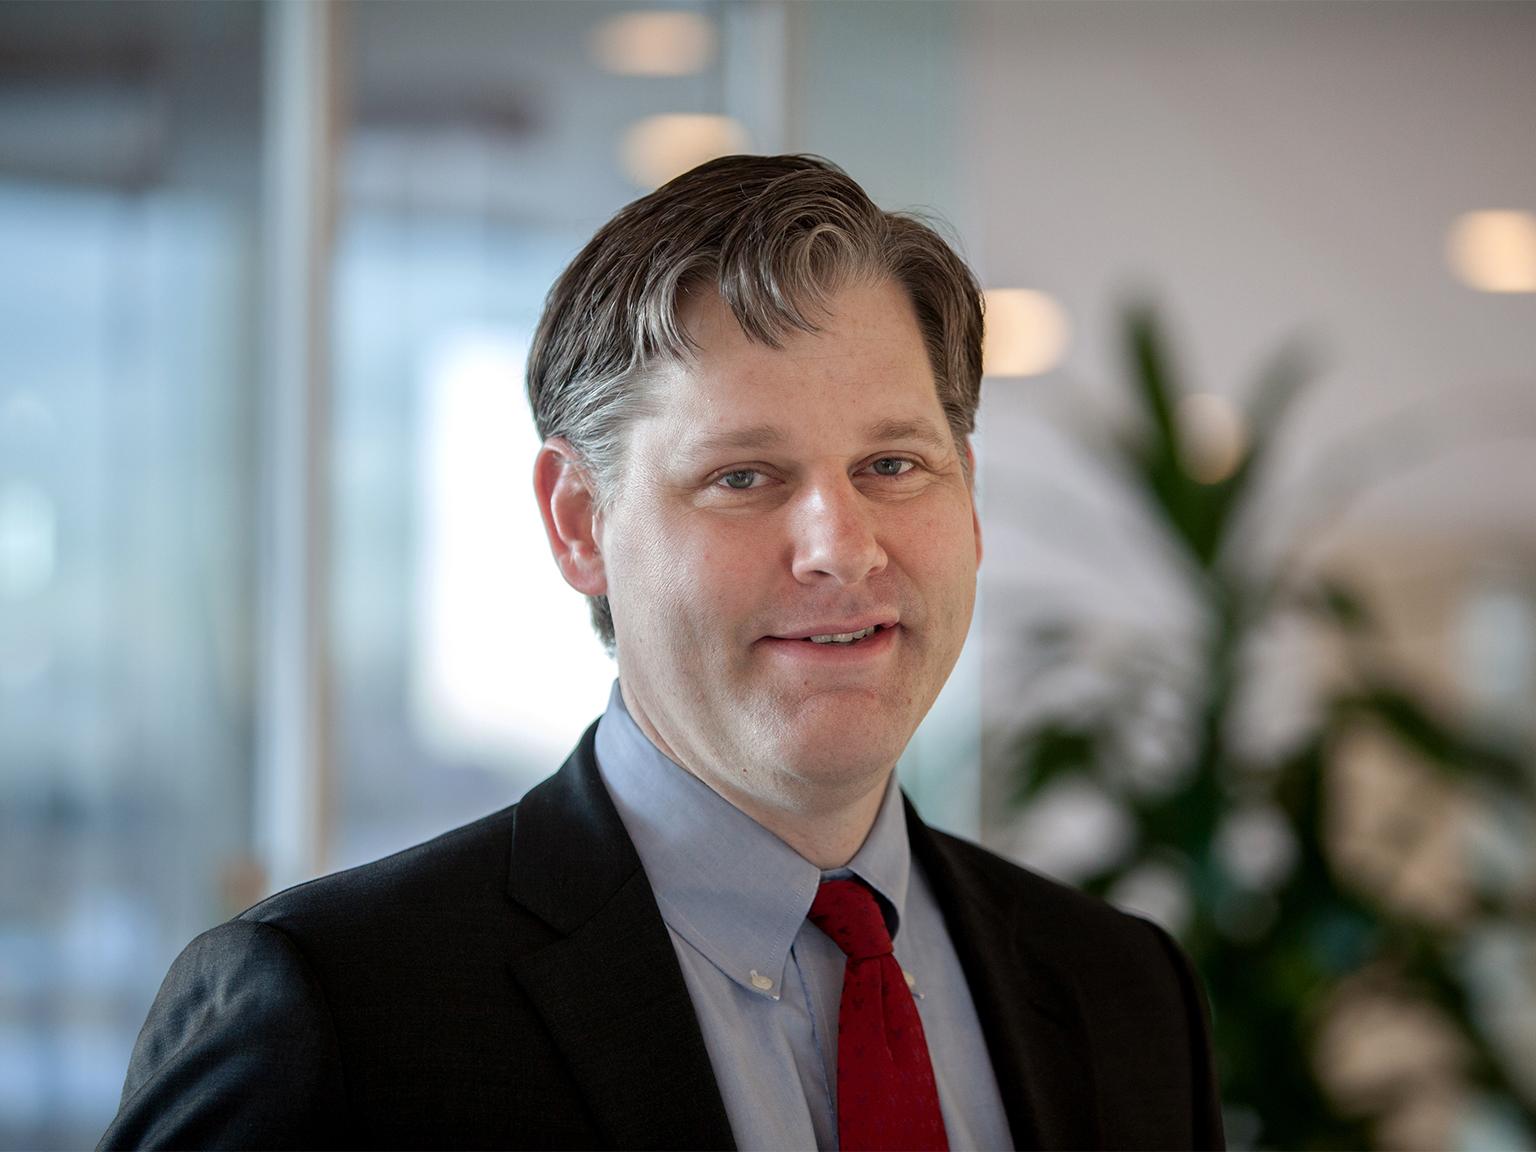 Missouri Gov. Greitens picks chief operating officer